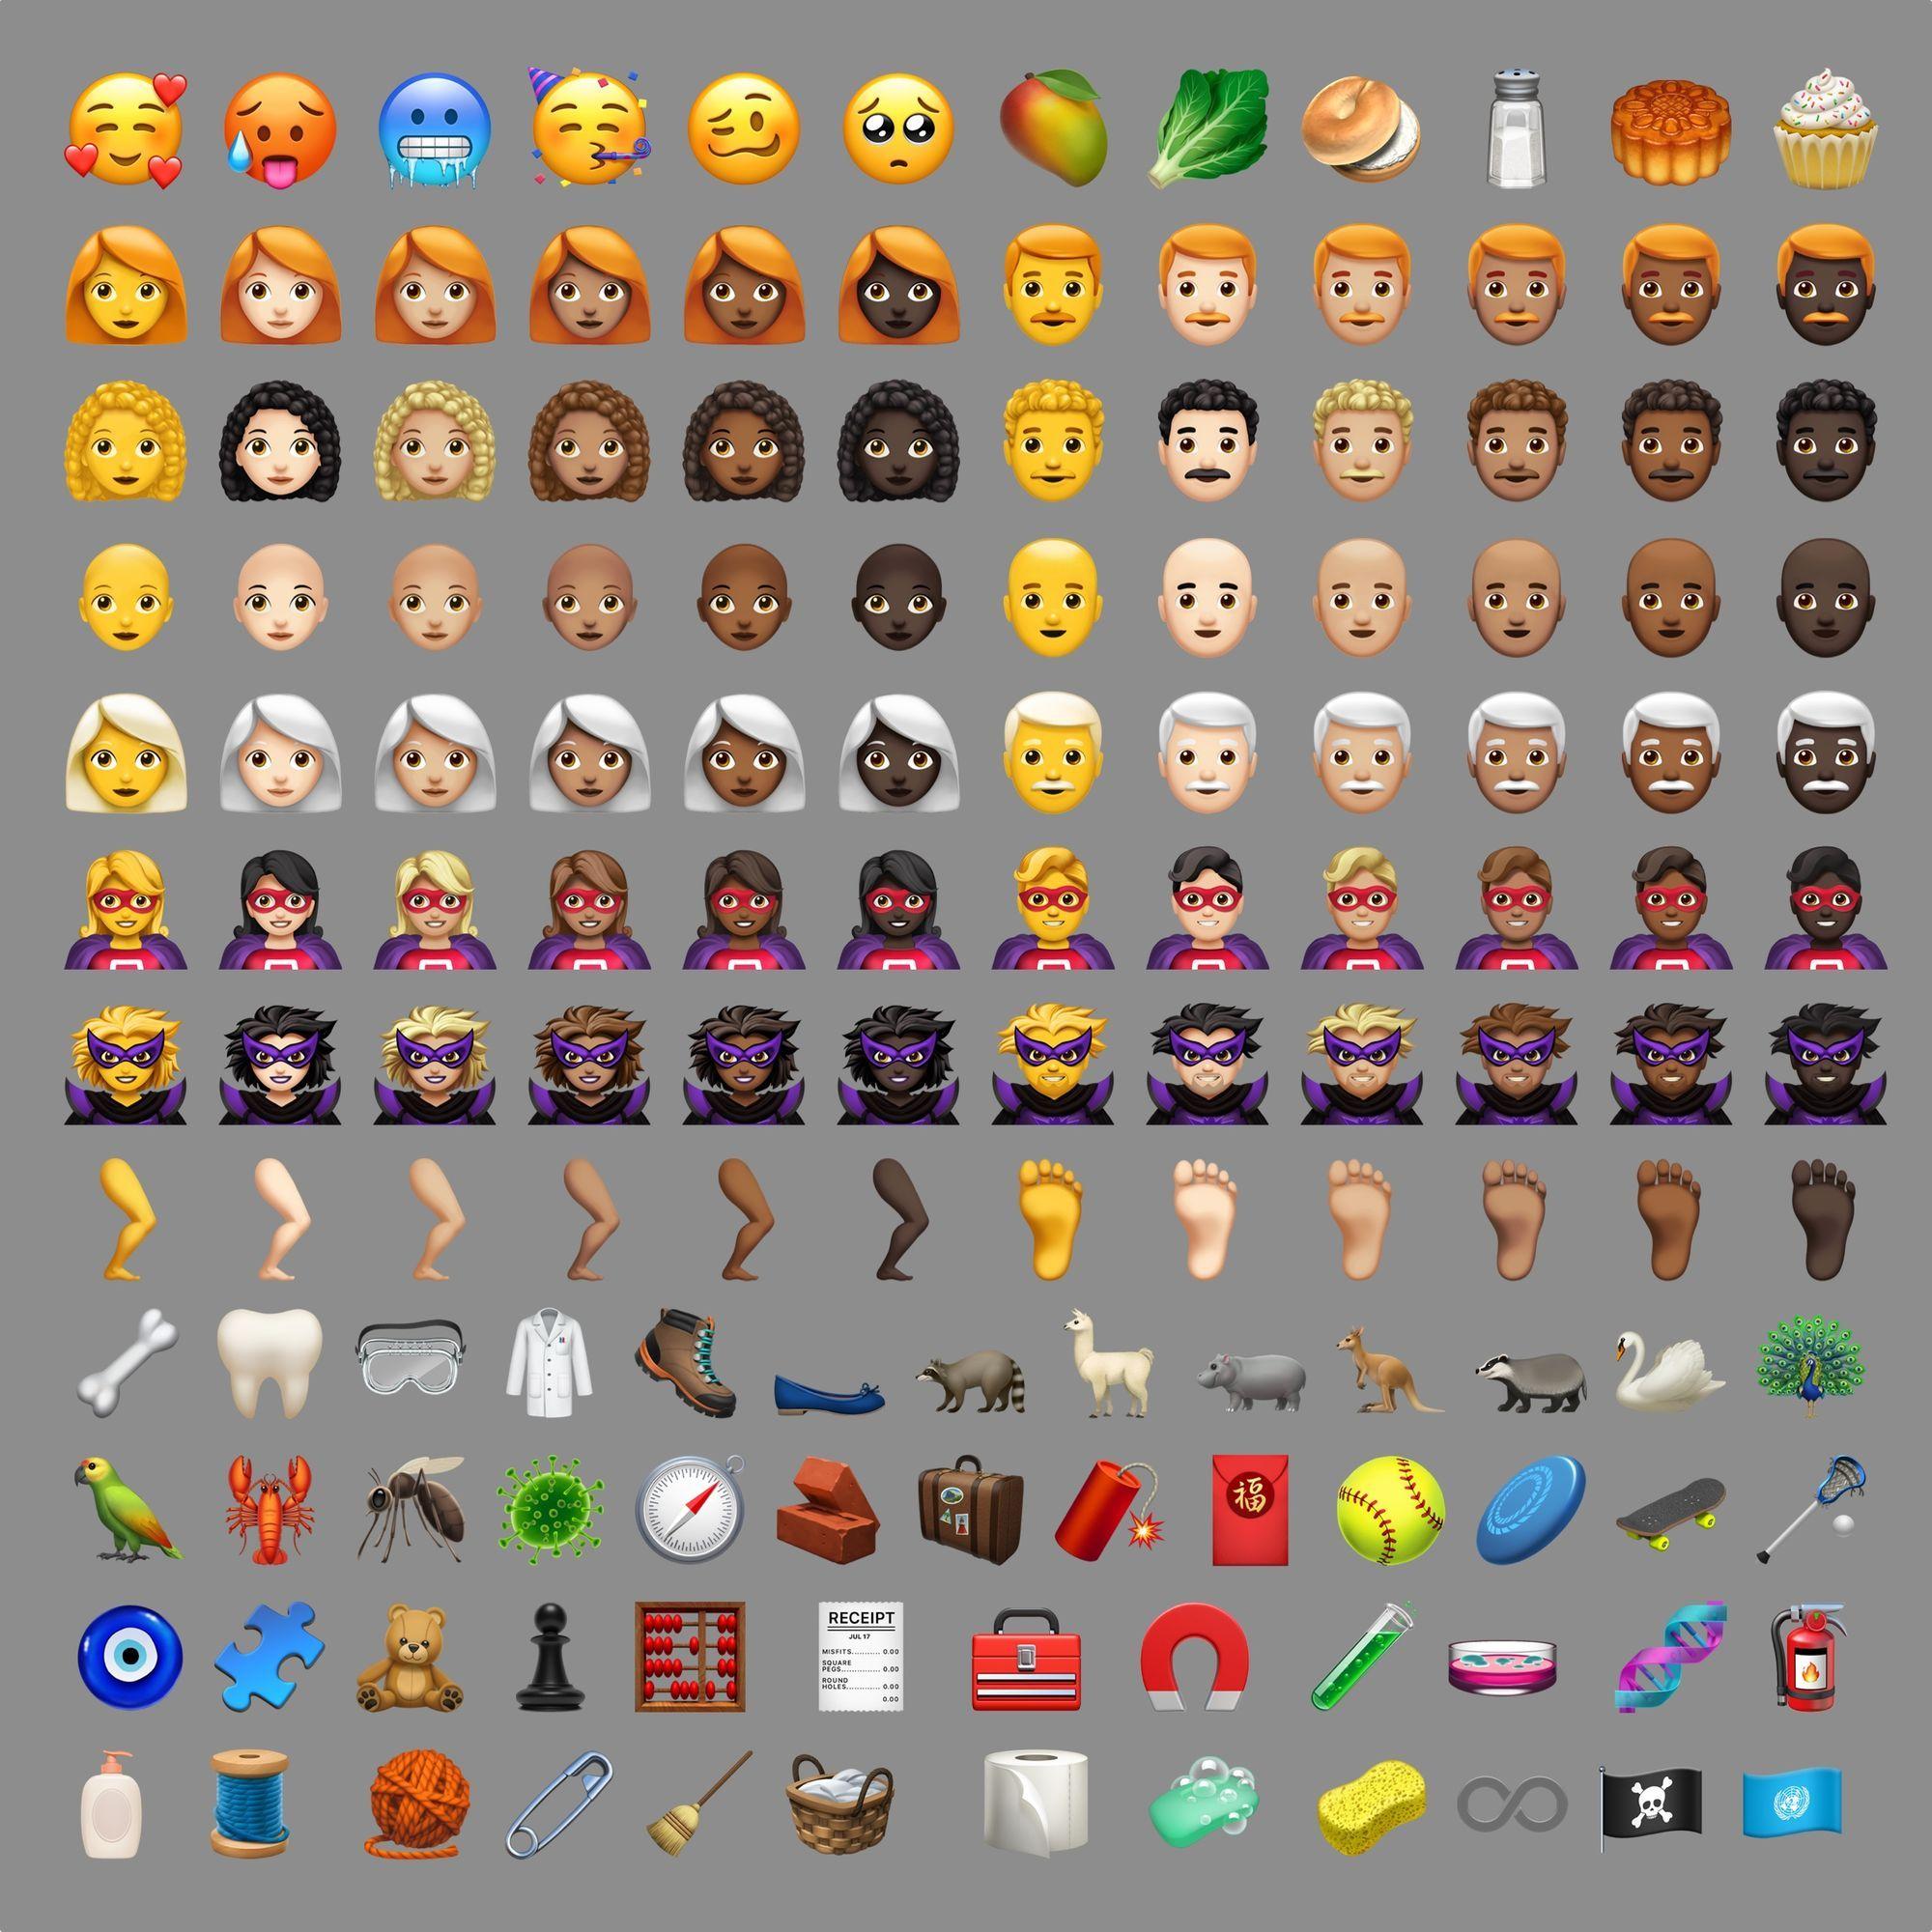 Ios 12 1 Emoji Changelog Emoji New Emojis Snapchat Stickers